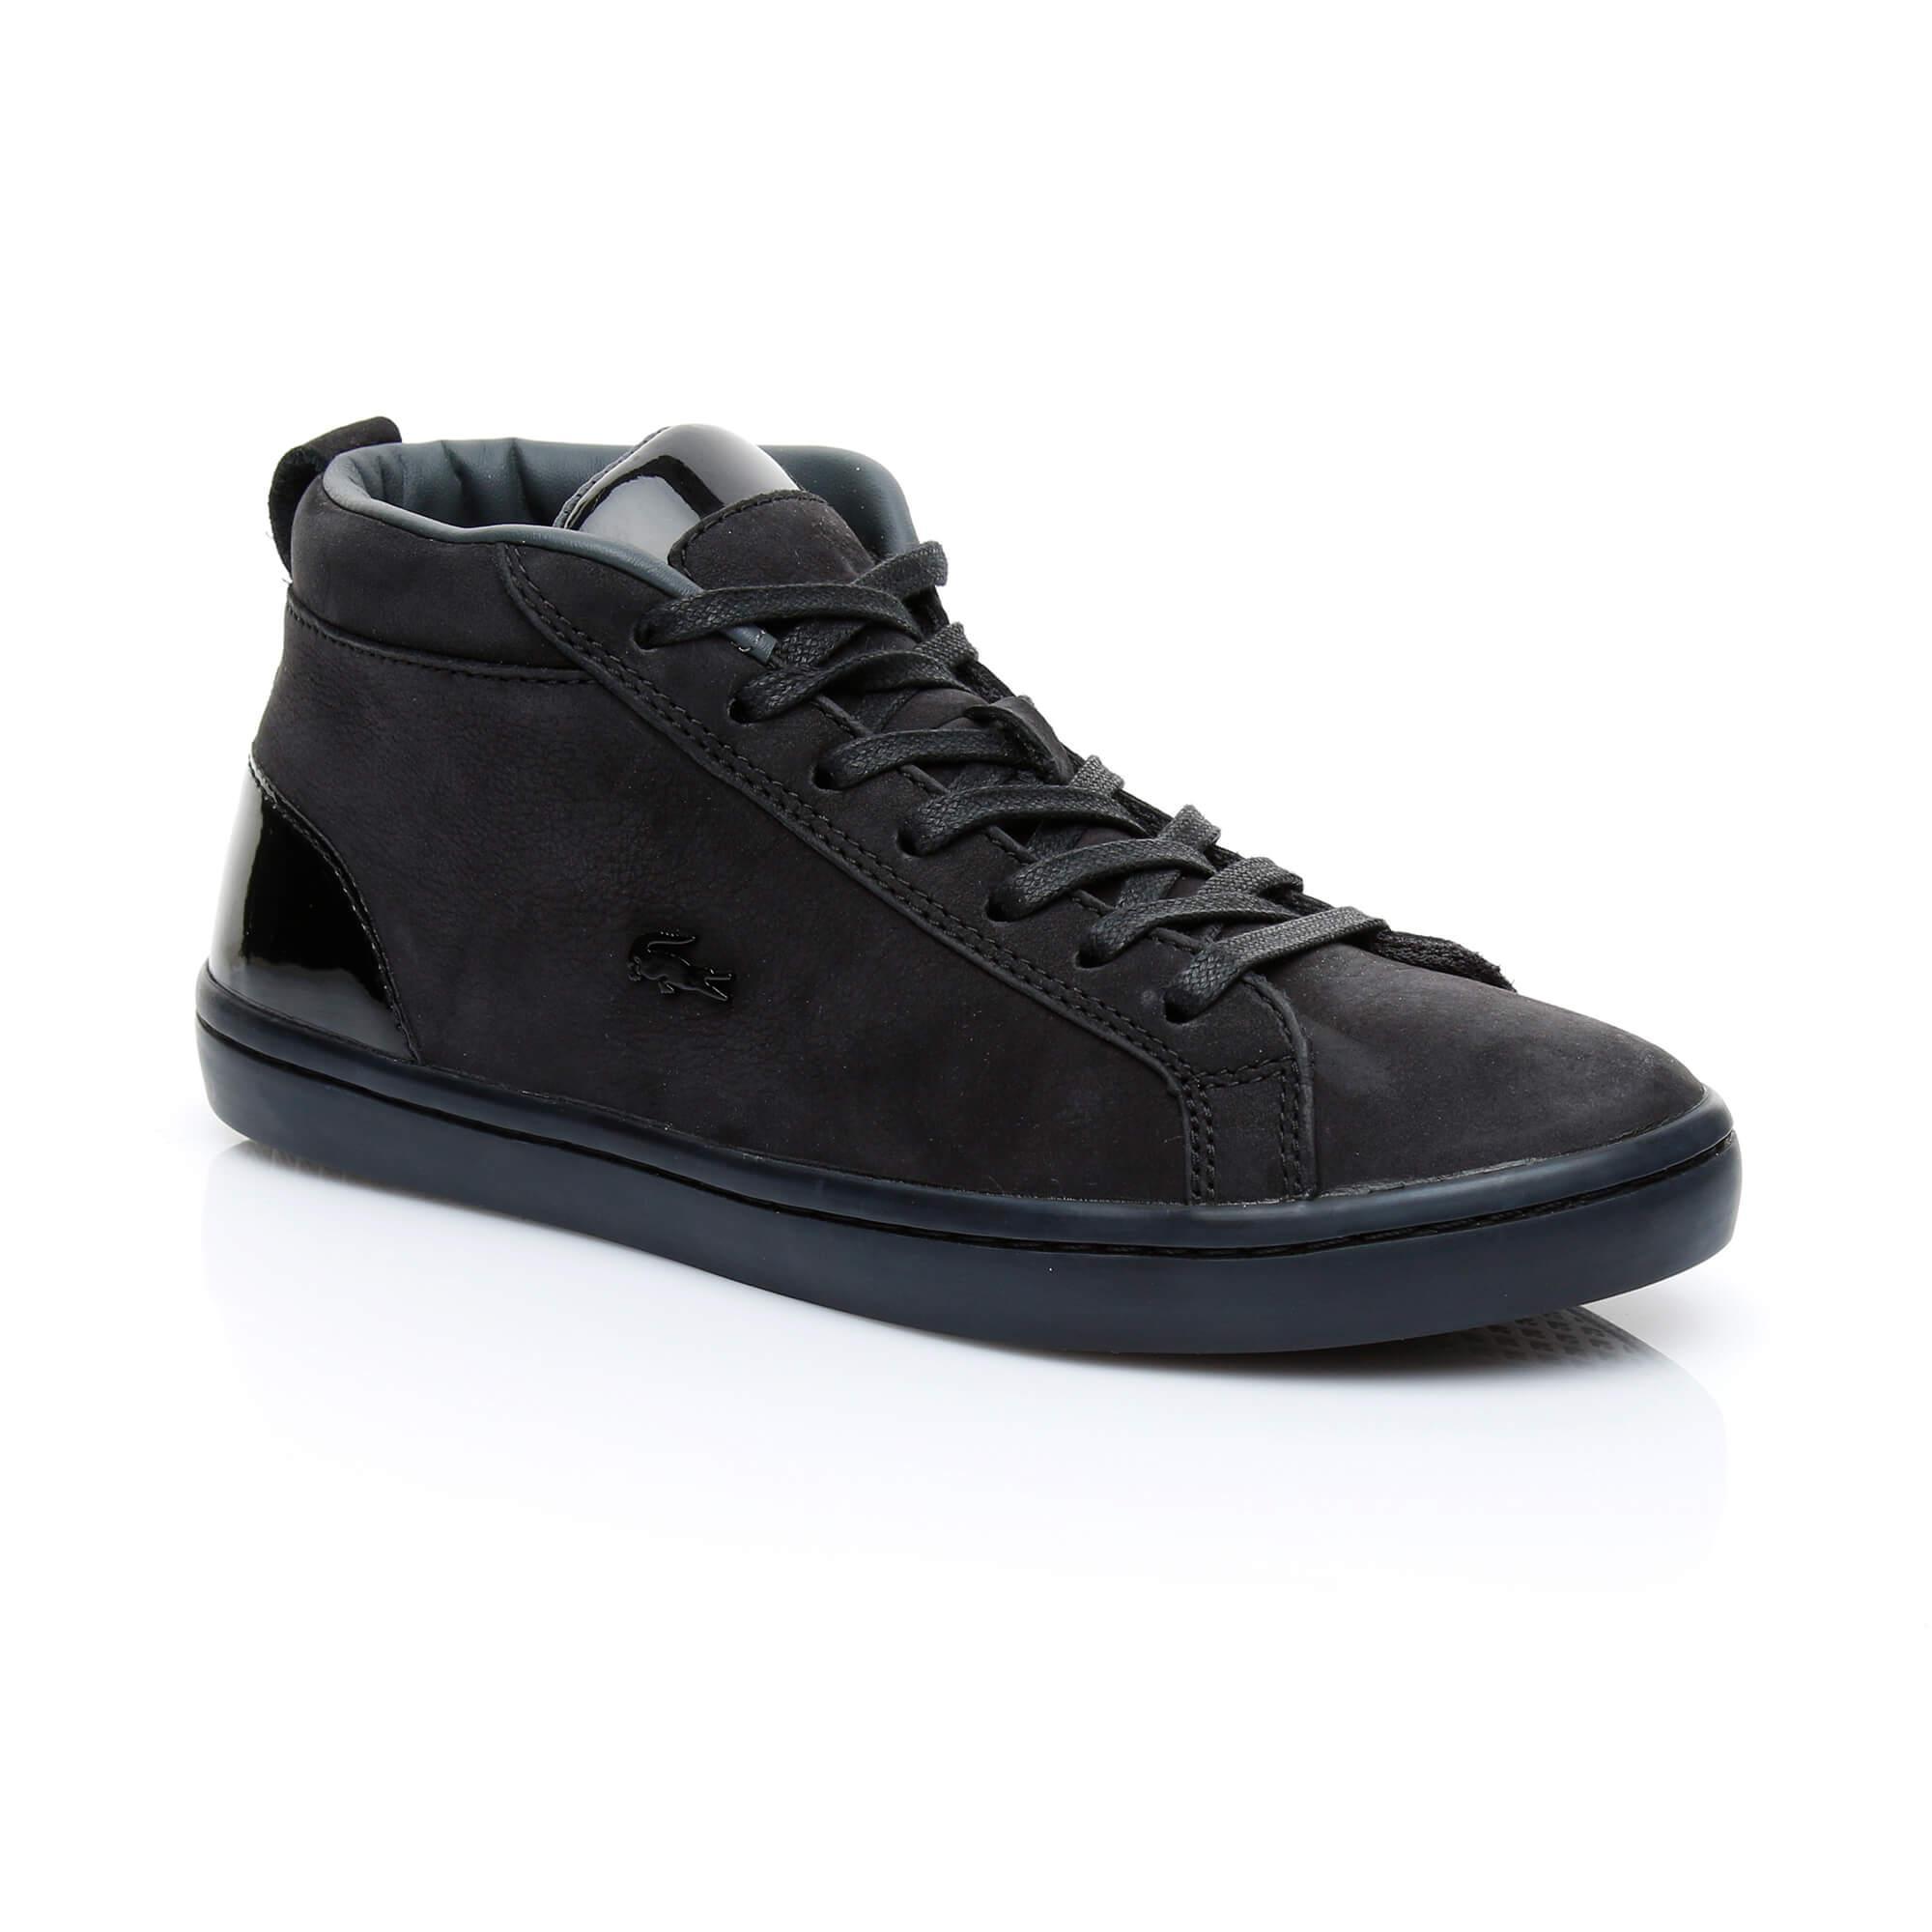 Lacoste Straightset C 318 1 Women's Boots